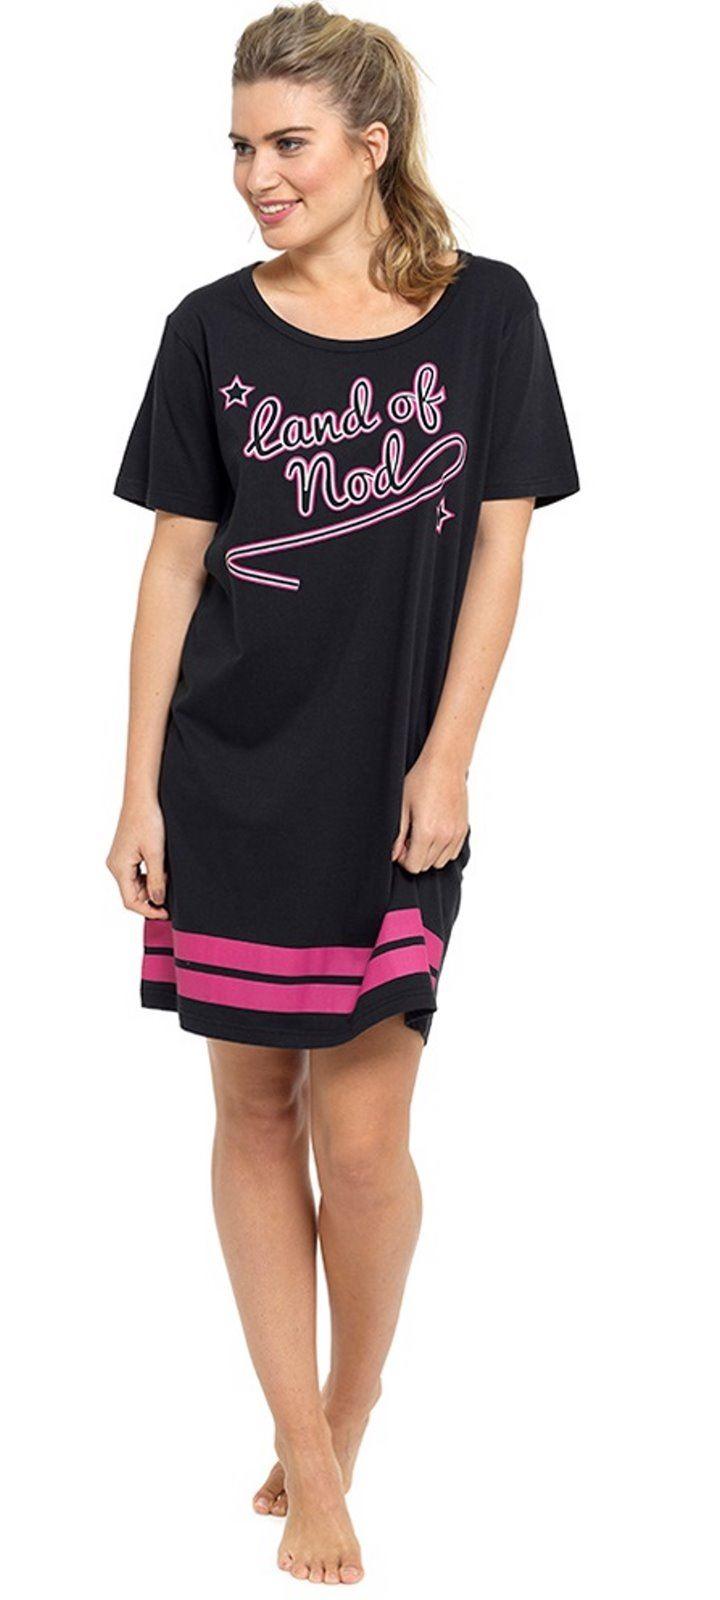 Black t shirt nightdress - Ladies Pink Black Girls Slogan Nightie Nightdress Short Sleeve Nightshirt